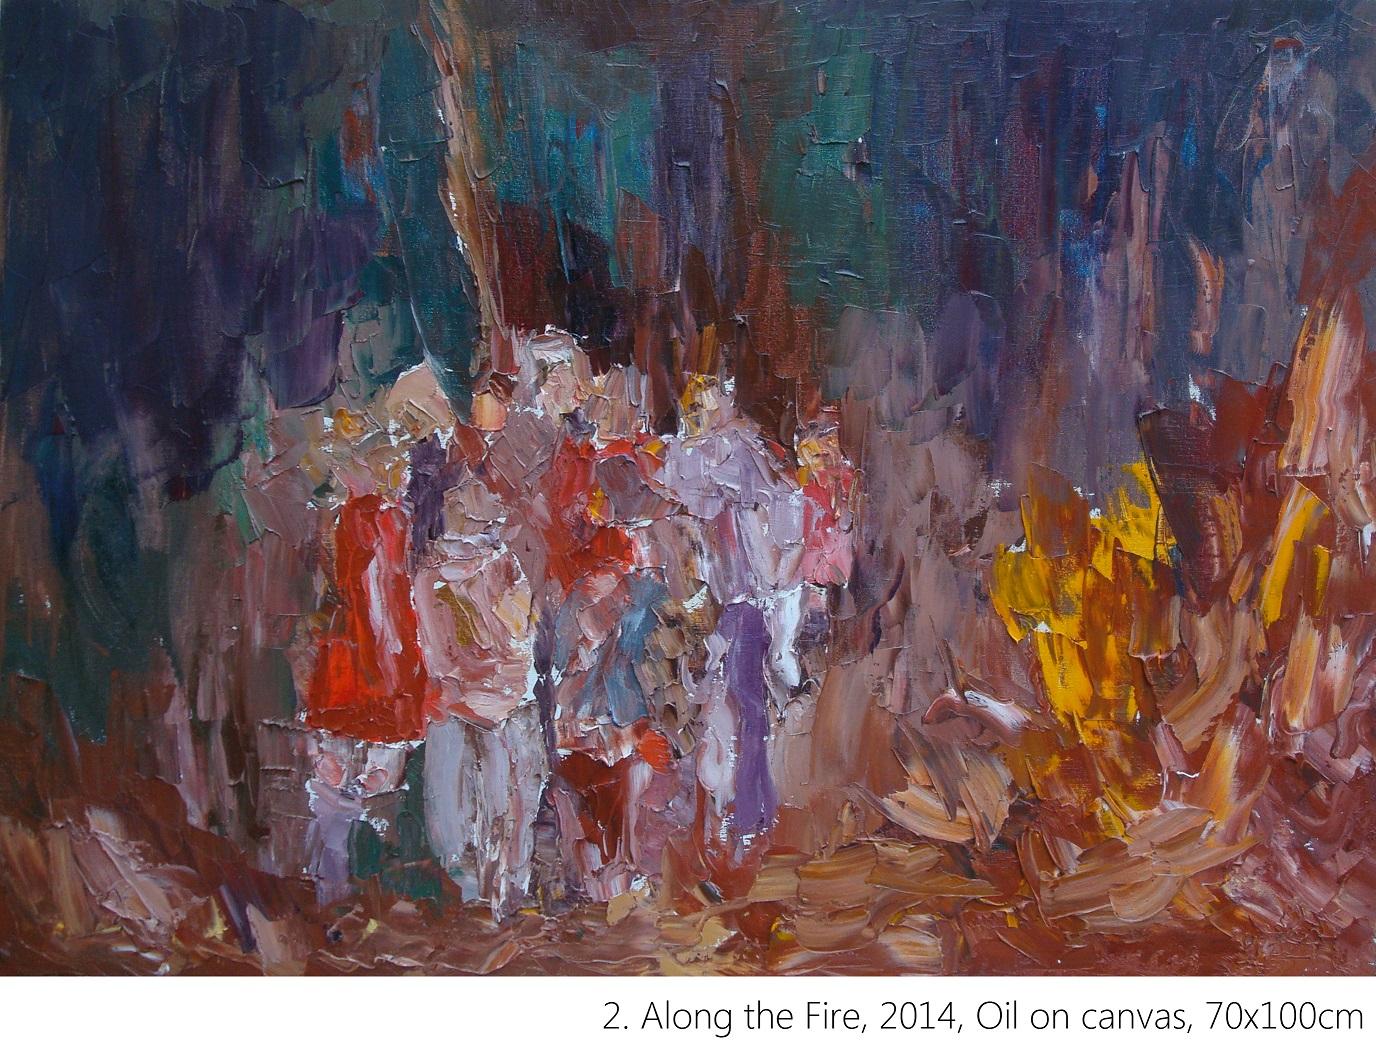 2. Along the Fire, 2014, Oil on canvas, 70x100cm